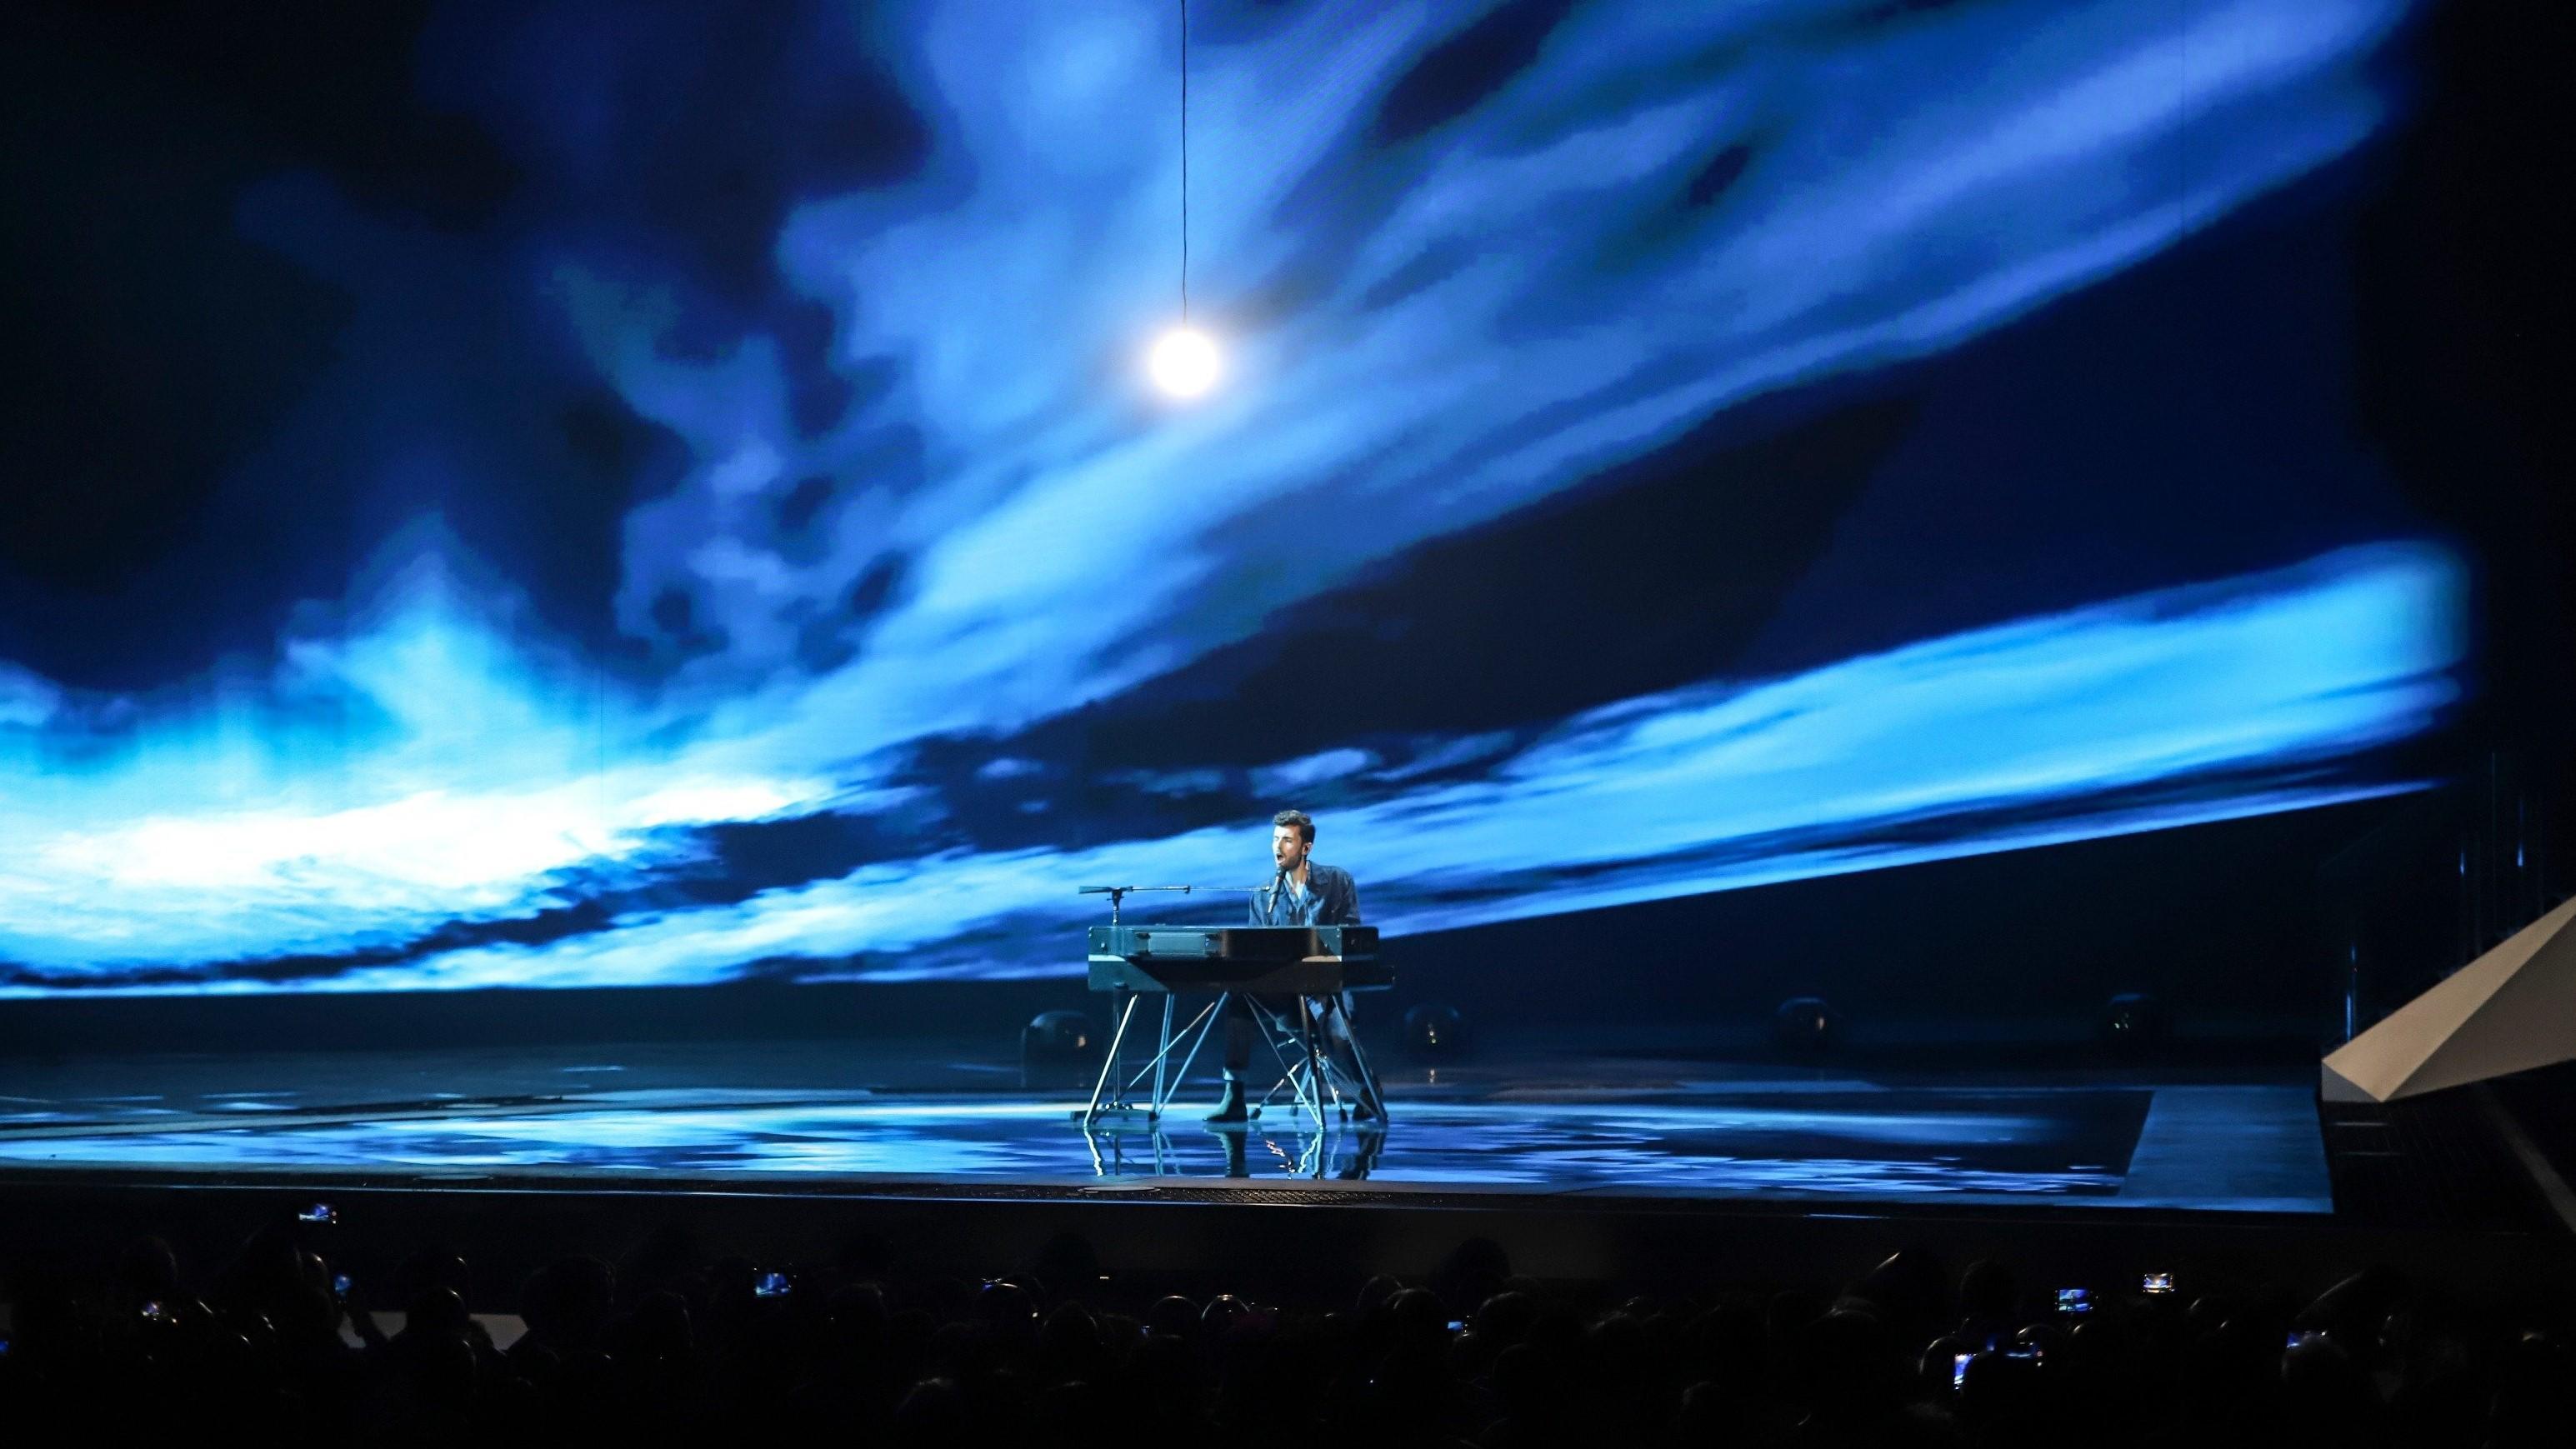 Winnaarsmedley tijdens finale Eurovisie Songfestival